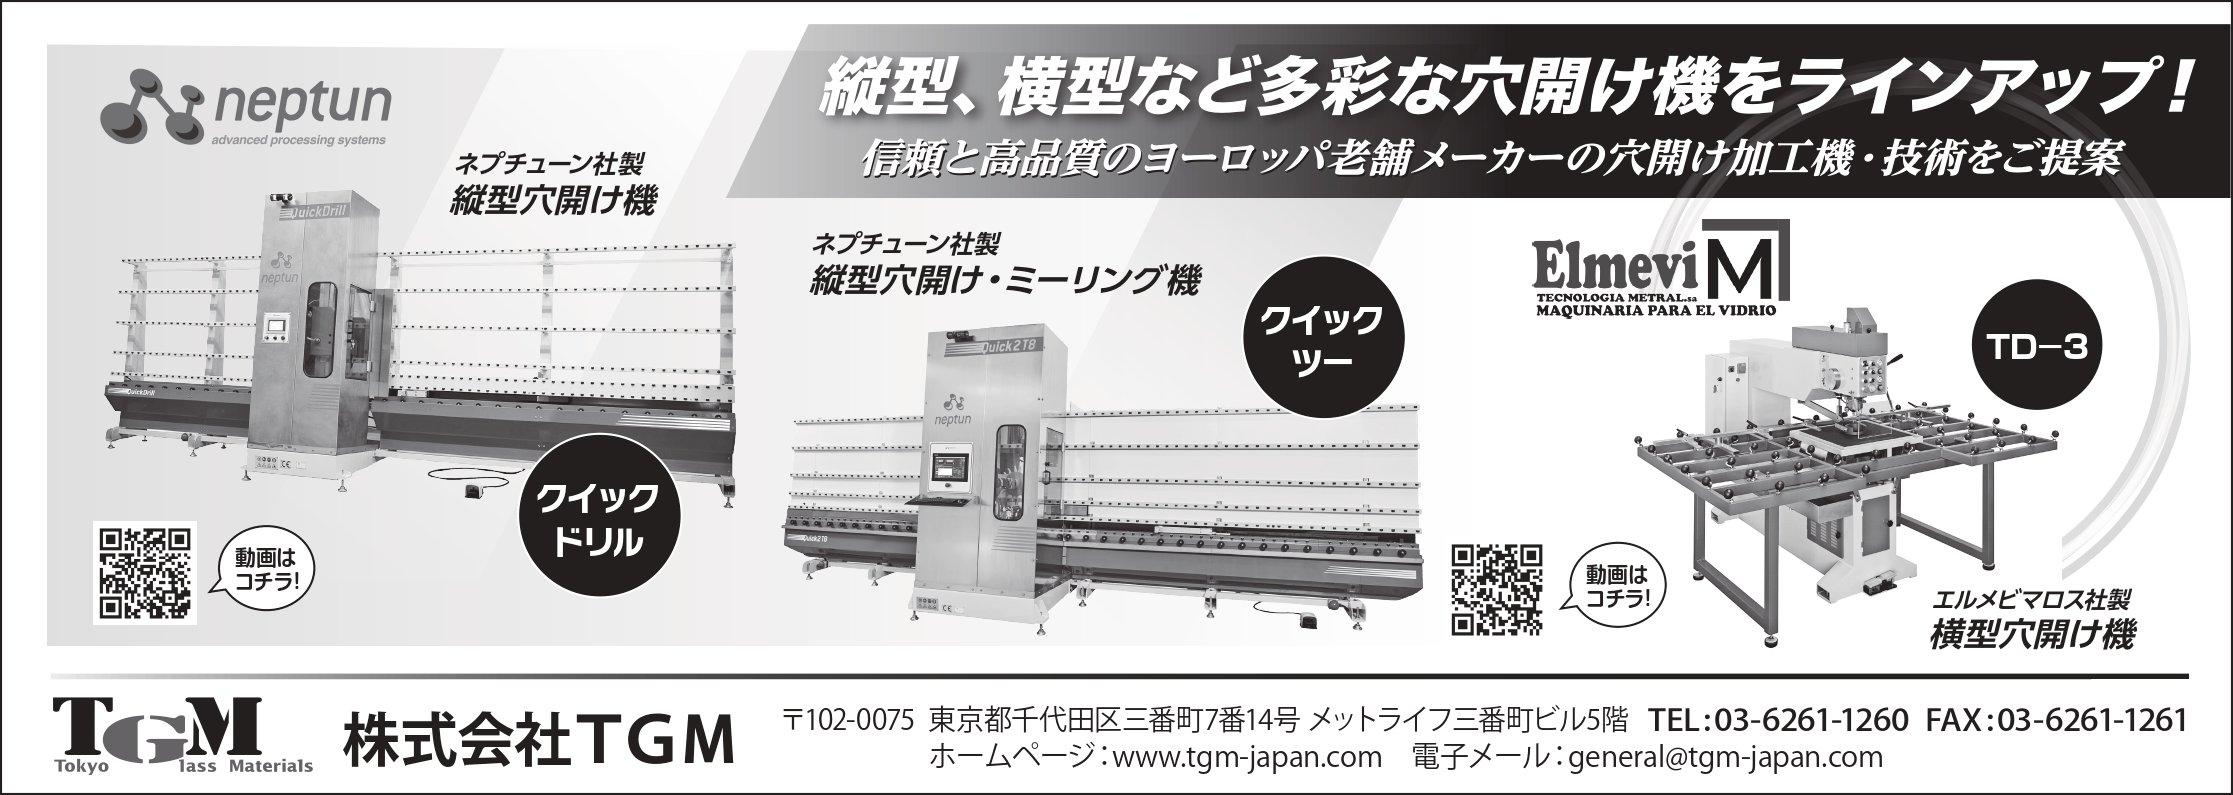 21.07.18-25 TGM様_広告図案修正2_page-0001.jpg